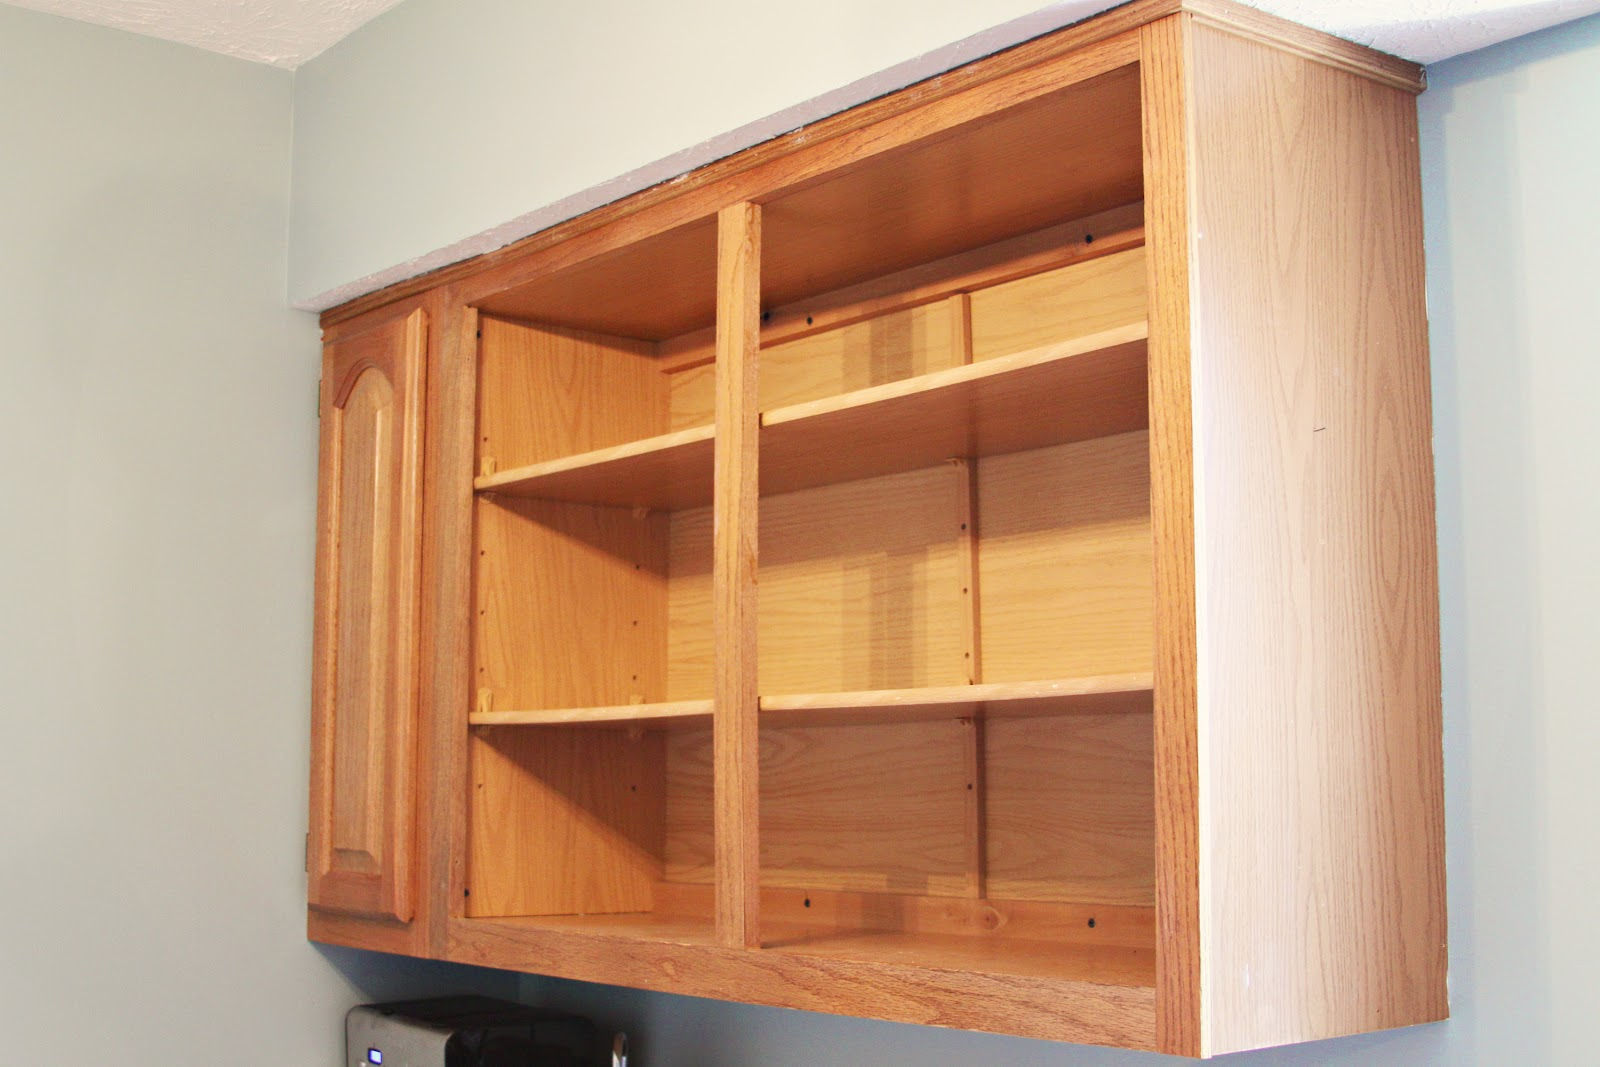 Kitchen Cabinet Shelves Honey Oak Cabinets Casa De Luna Creations Open Shelving